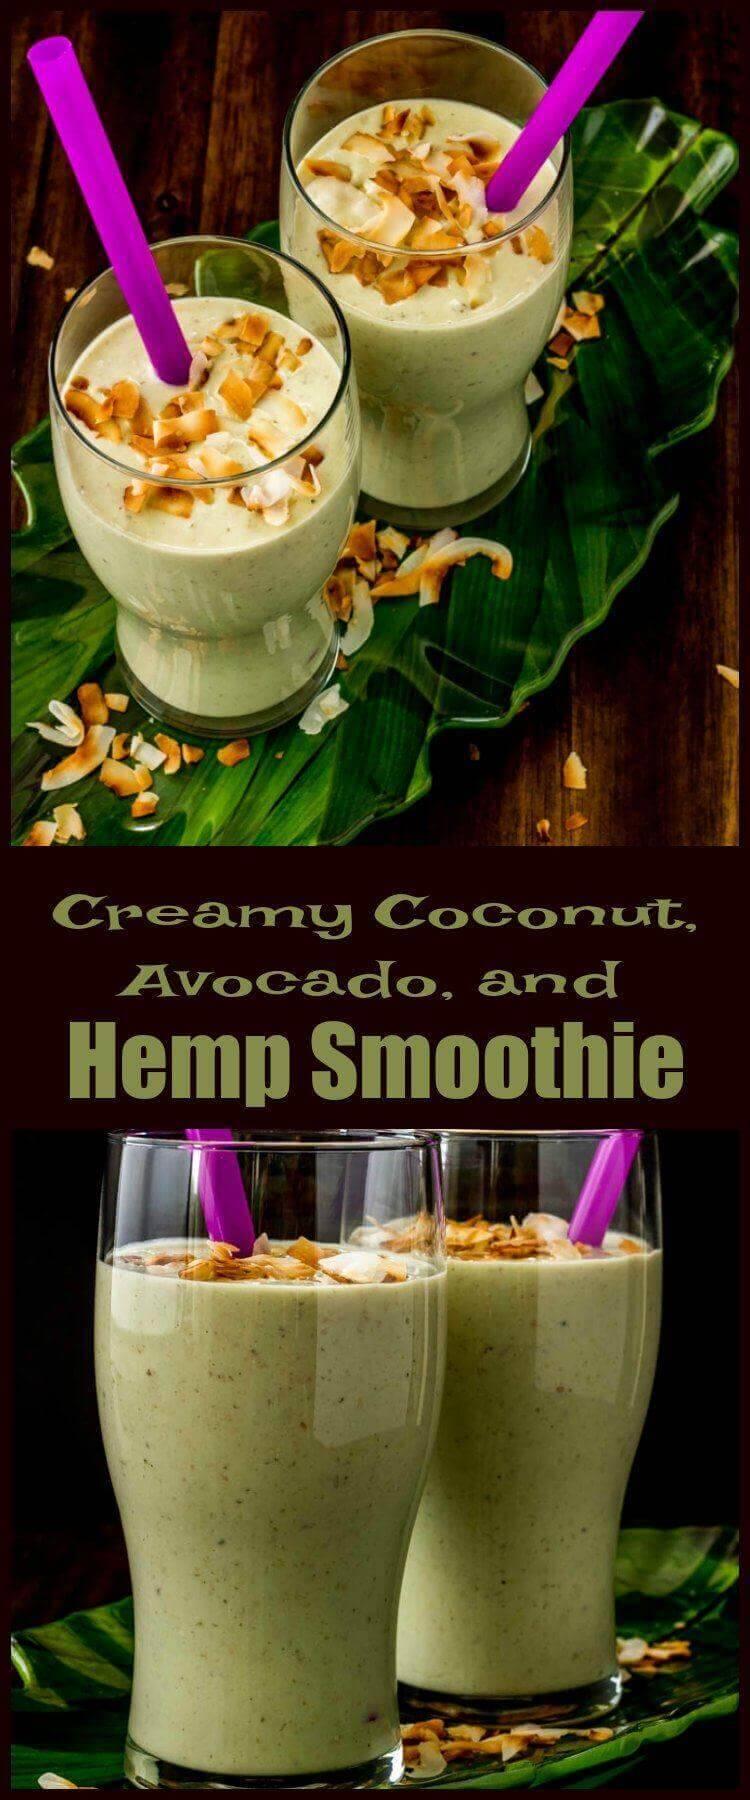 Creamy Coconut, Avocado, and Hemp Smoothie